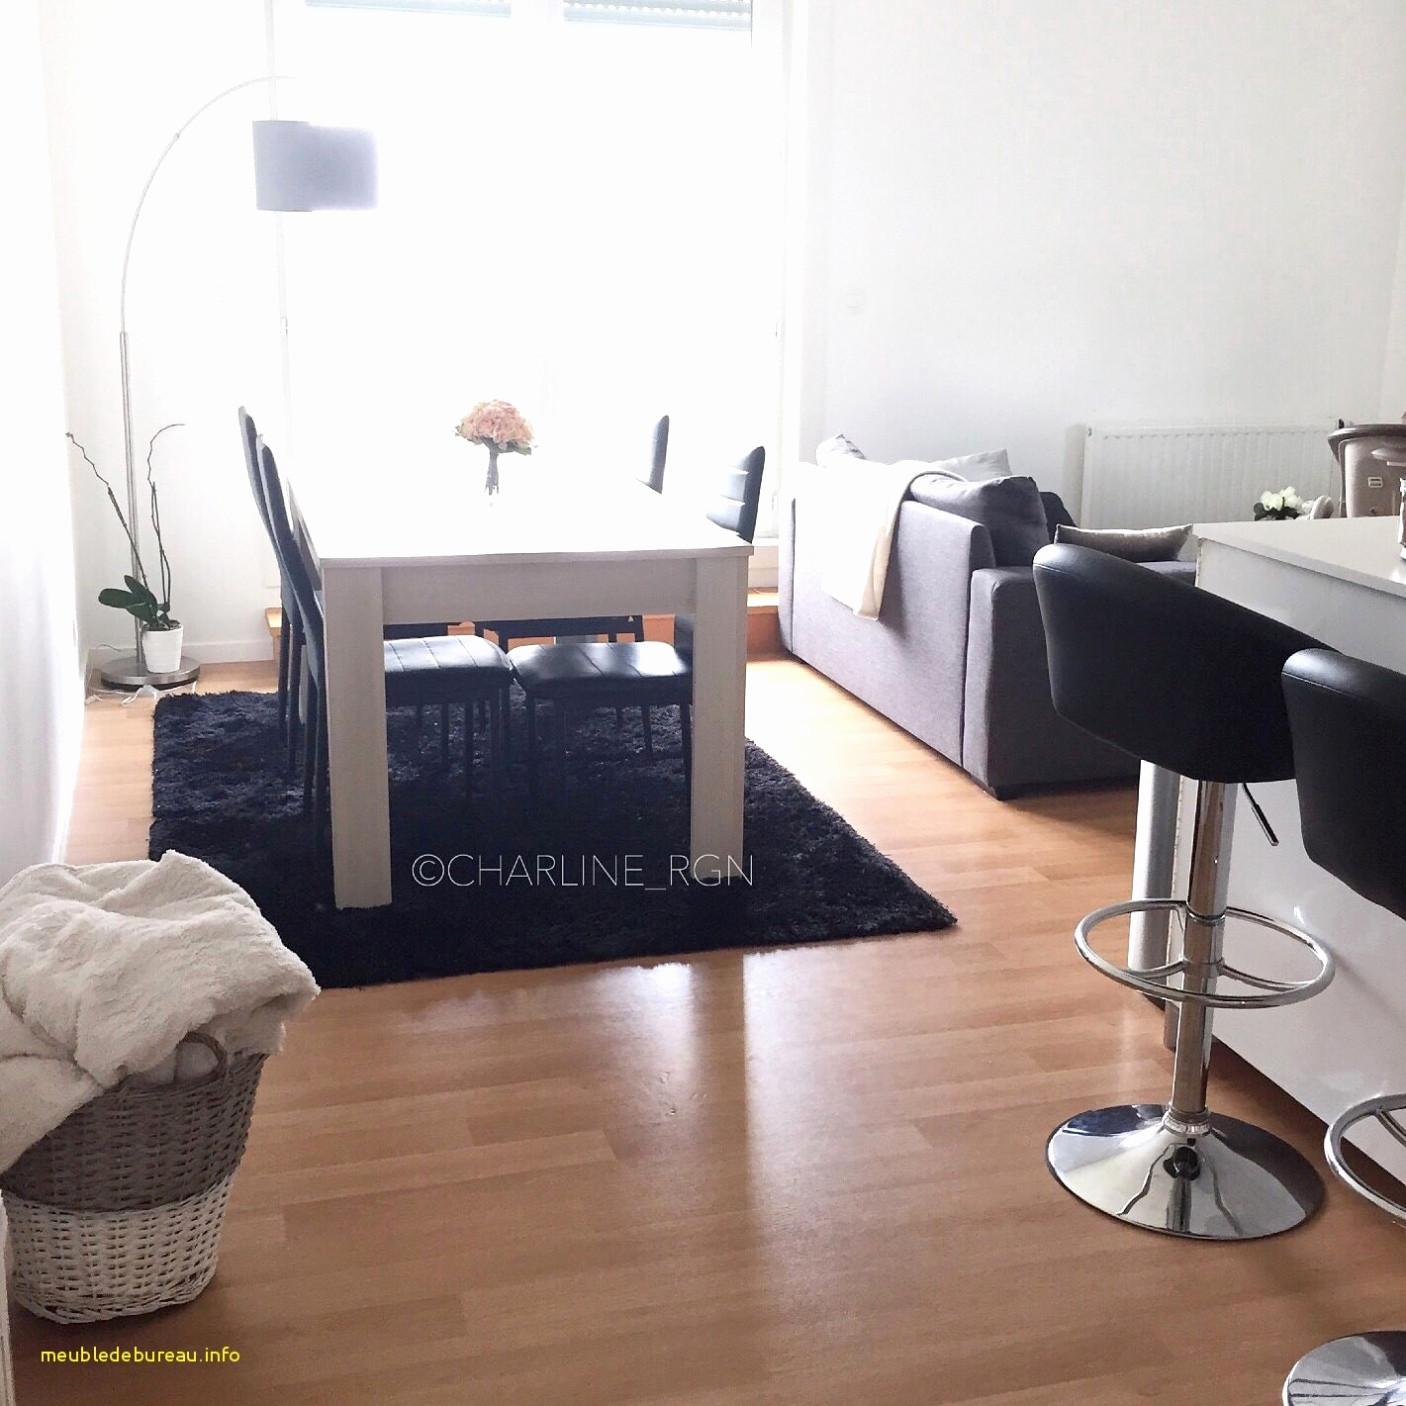 meuble pour salon meuble pour salon meuble alex ikea awesome fauteuil salon ikea fresh of meuble pour salon 1